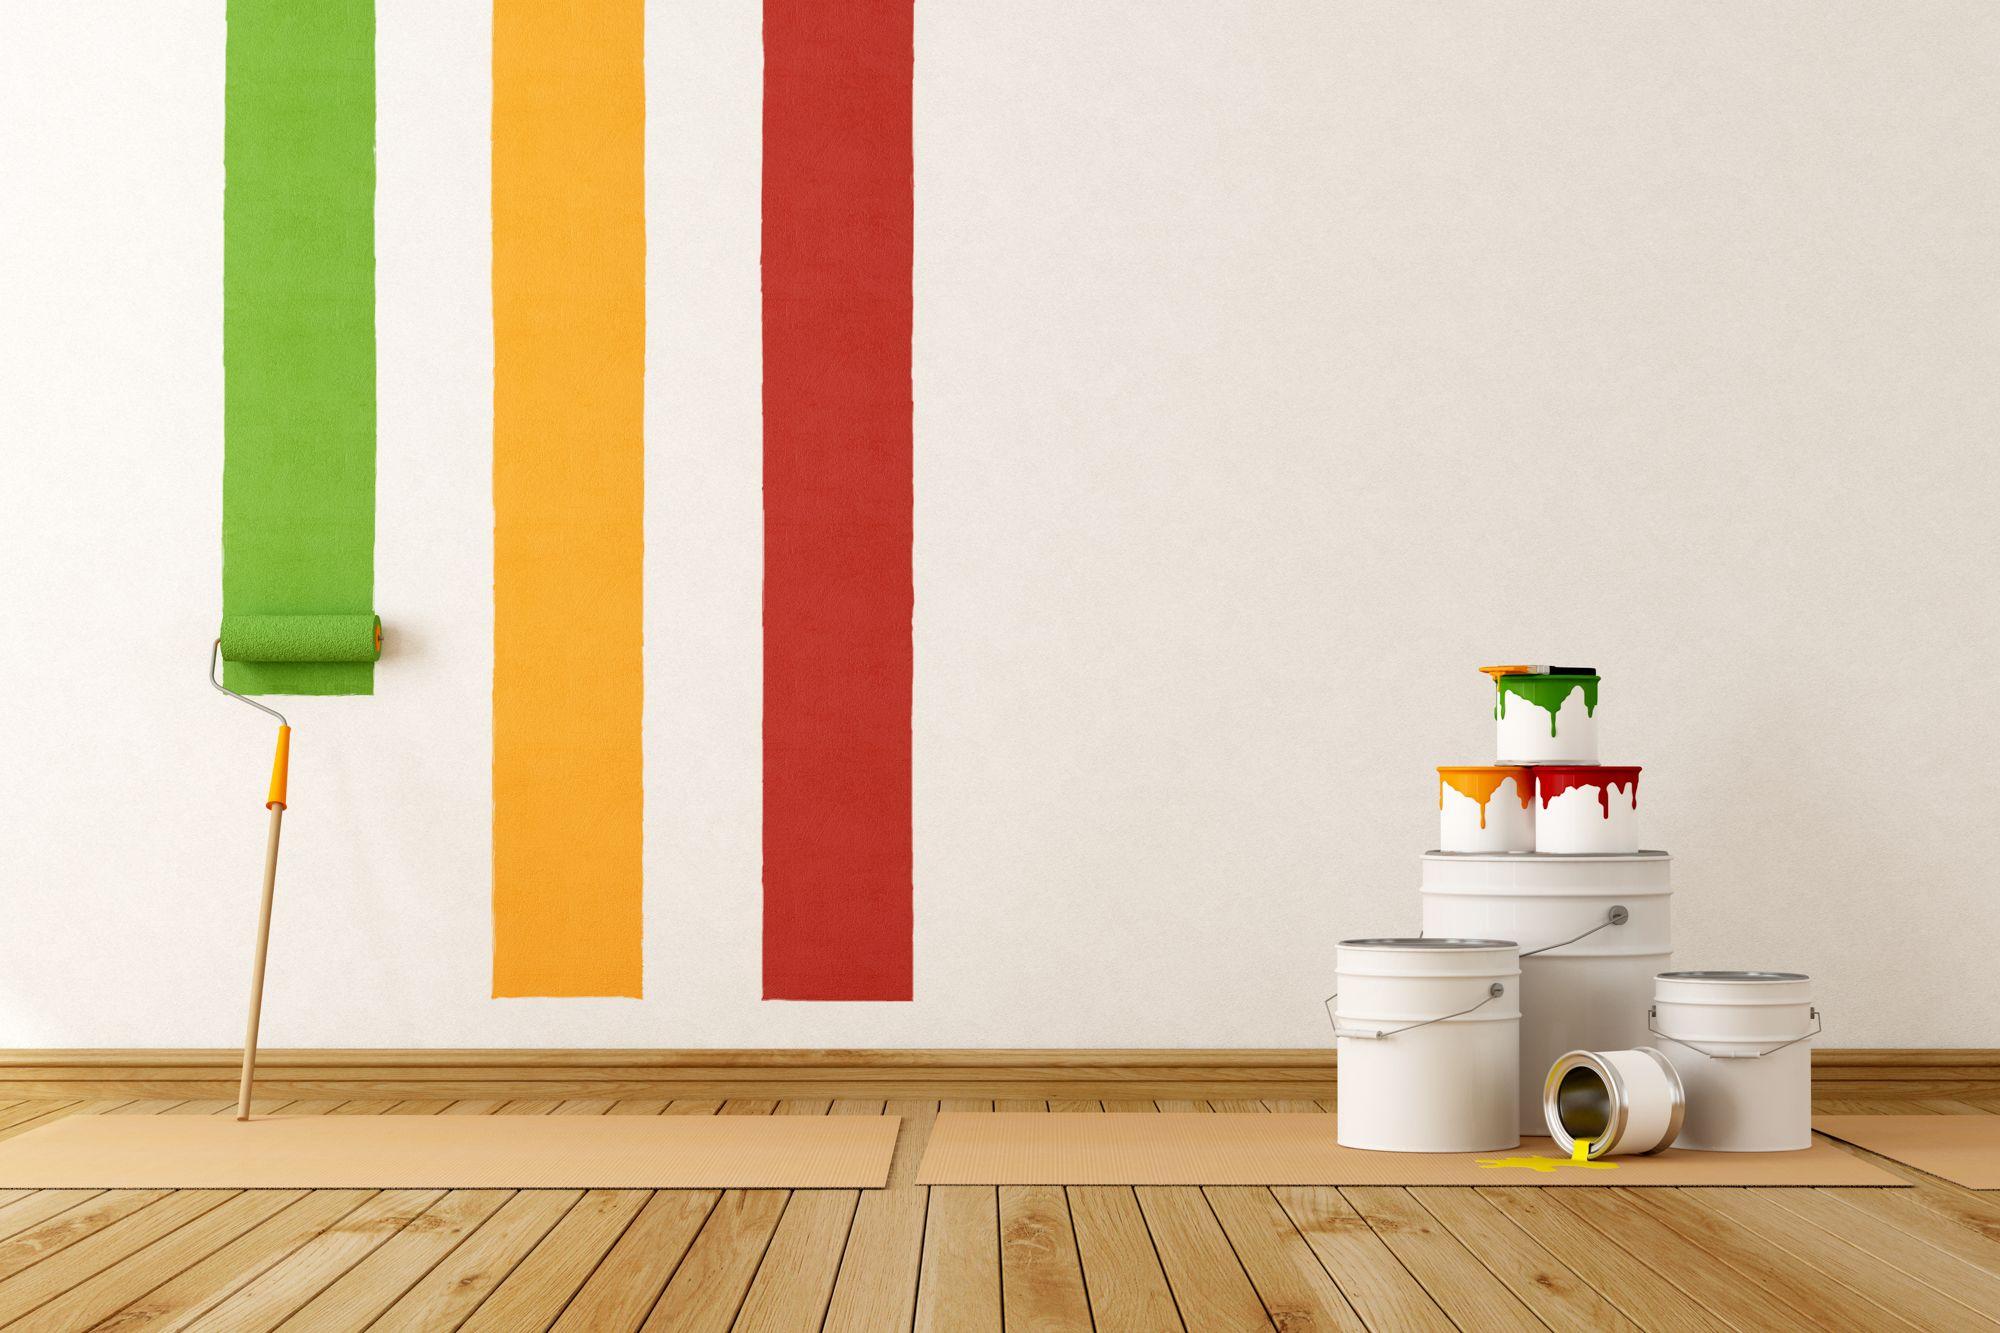 wall paint ideas-repainting walls